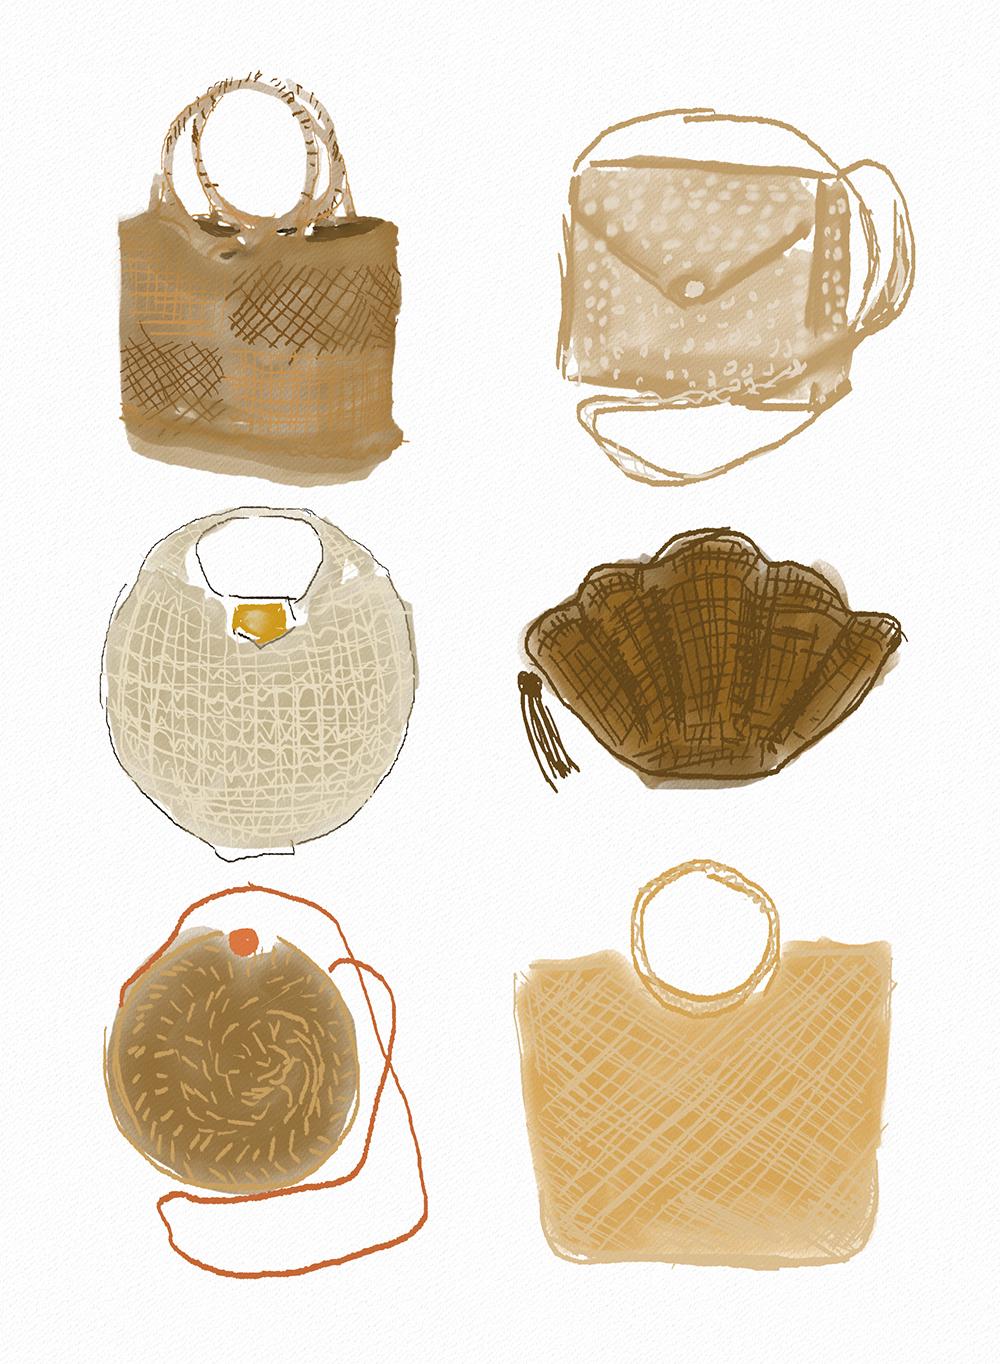 livvyland-blog-olivia-watson-wicker-rattan-basket-bags-spring-handbag